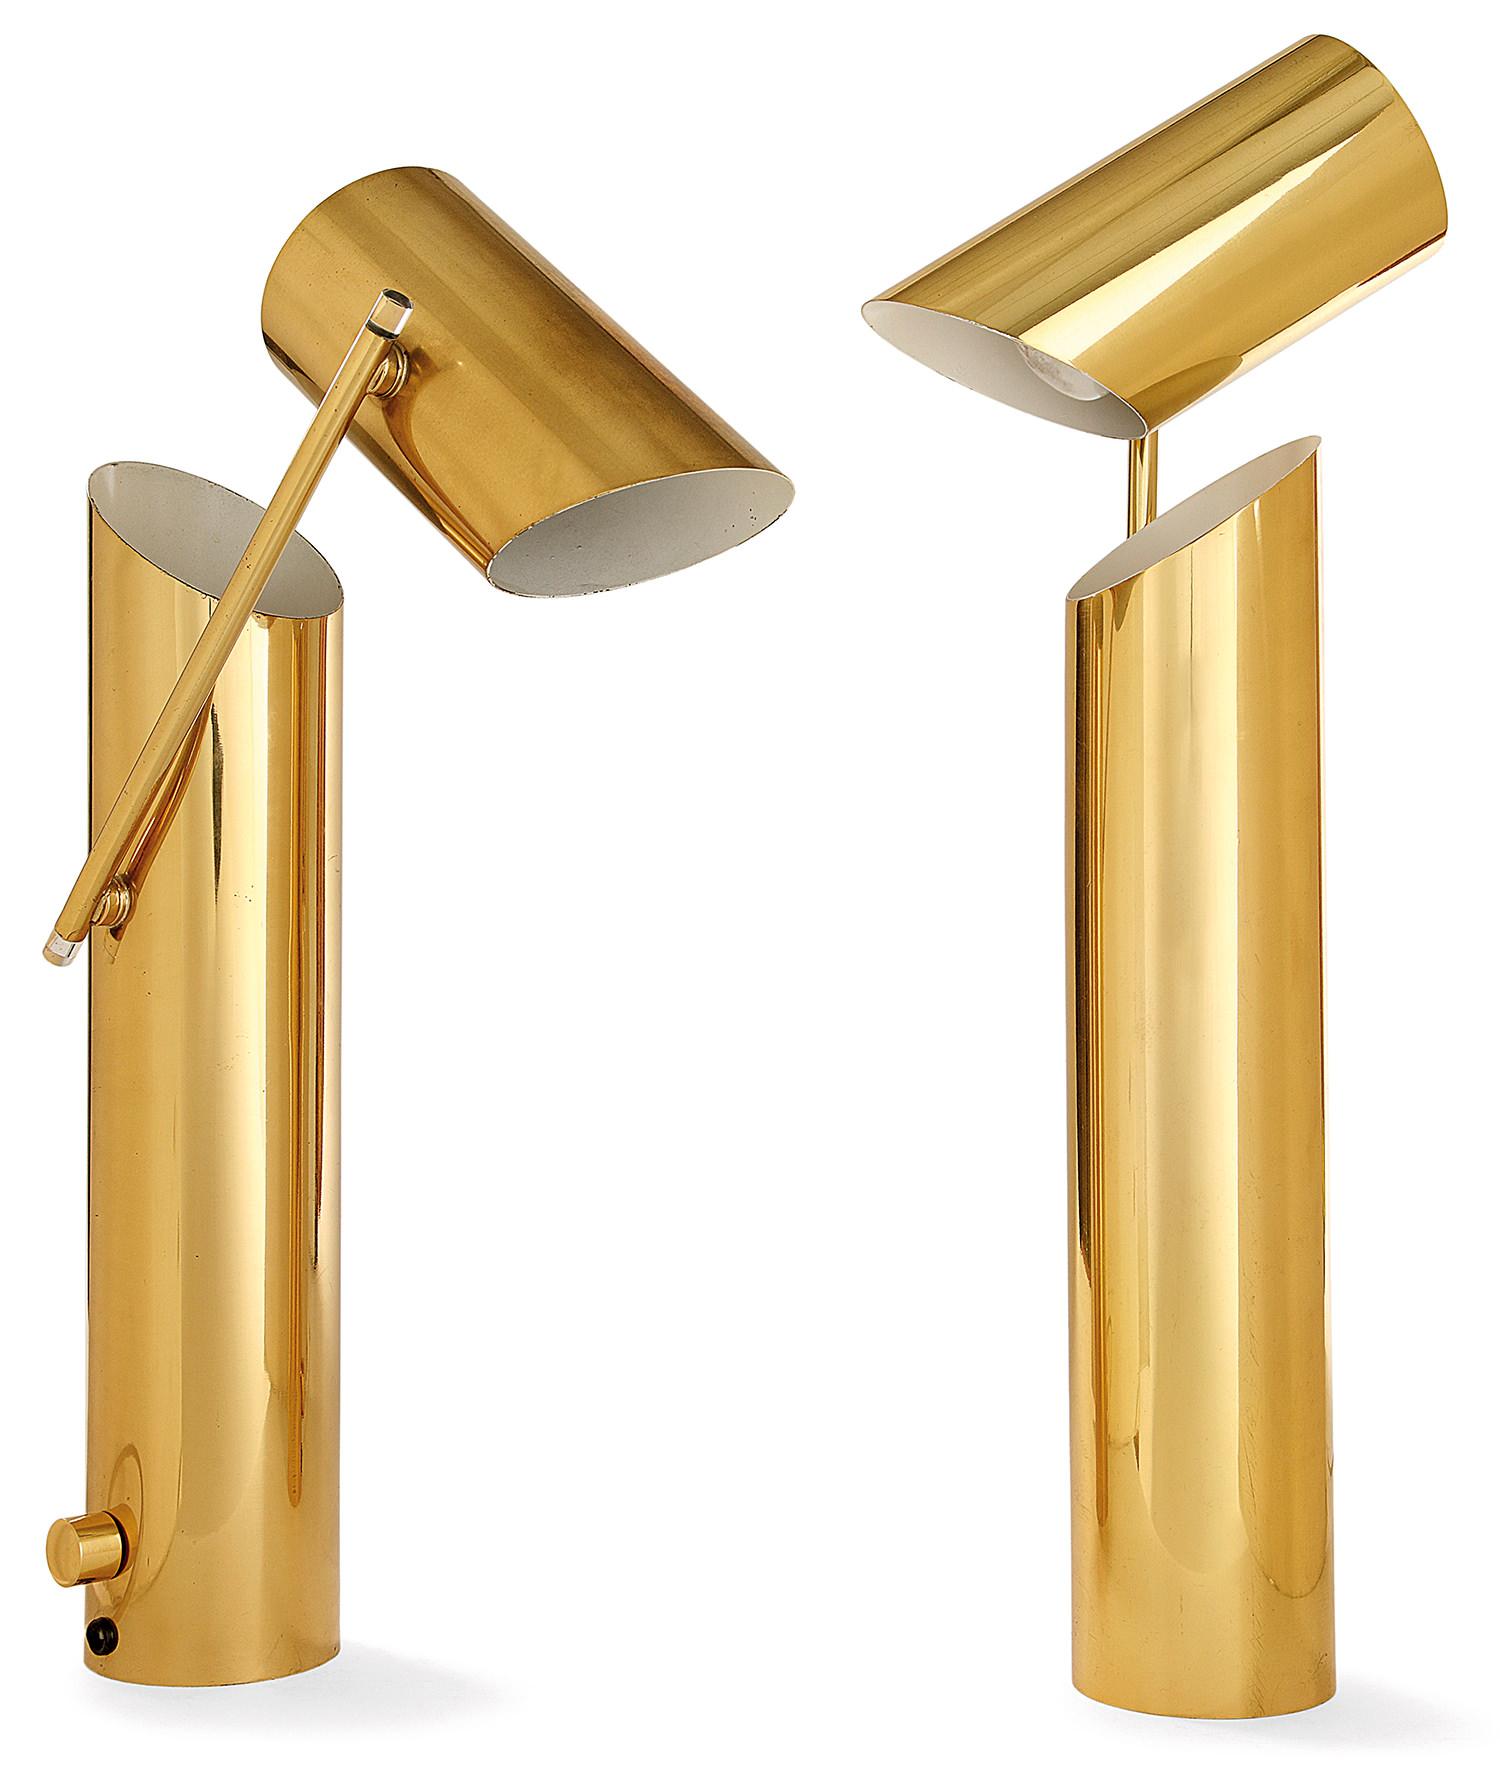 Angleo Lelli & Arredolce, c.1950 Rare pair of Brass Adjustable Lamps, Tajan Auction House, Paris